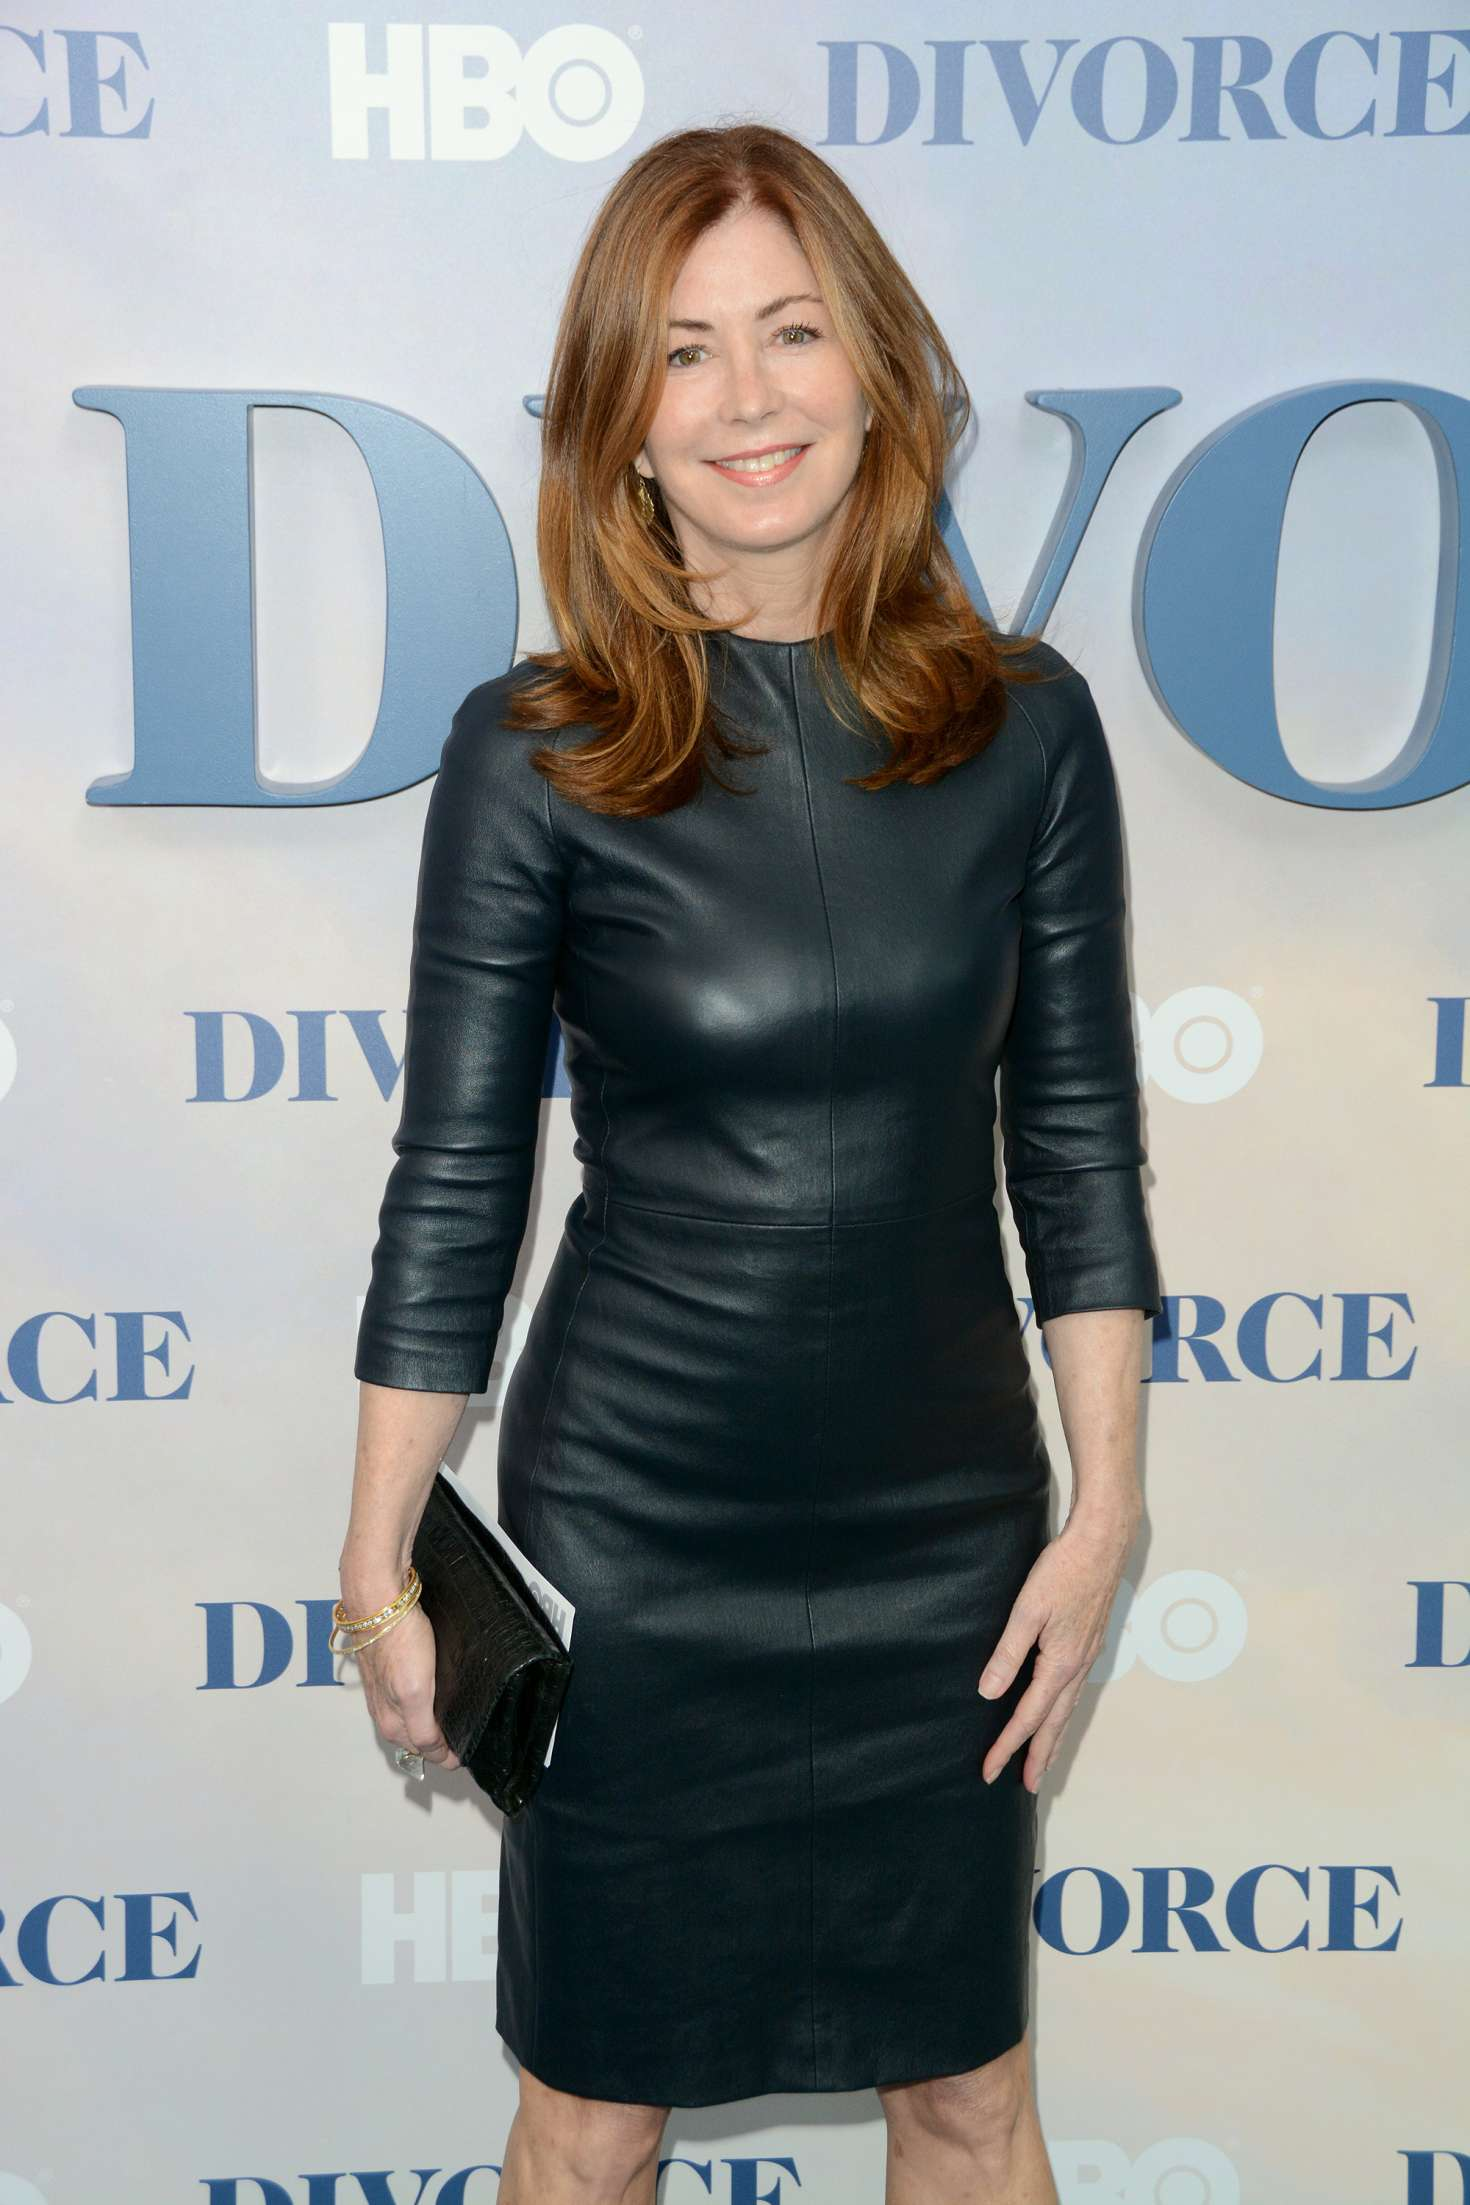 http://www.gotceleb.com/wp-content/uploads/photos/dana-delany/divorce-premiere-in-new-york/Dana-Delany:-Divorce-NY-Premiere--02.jpg